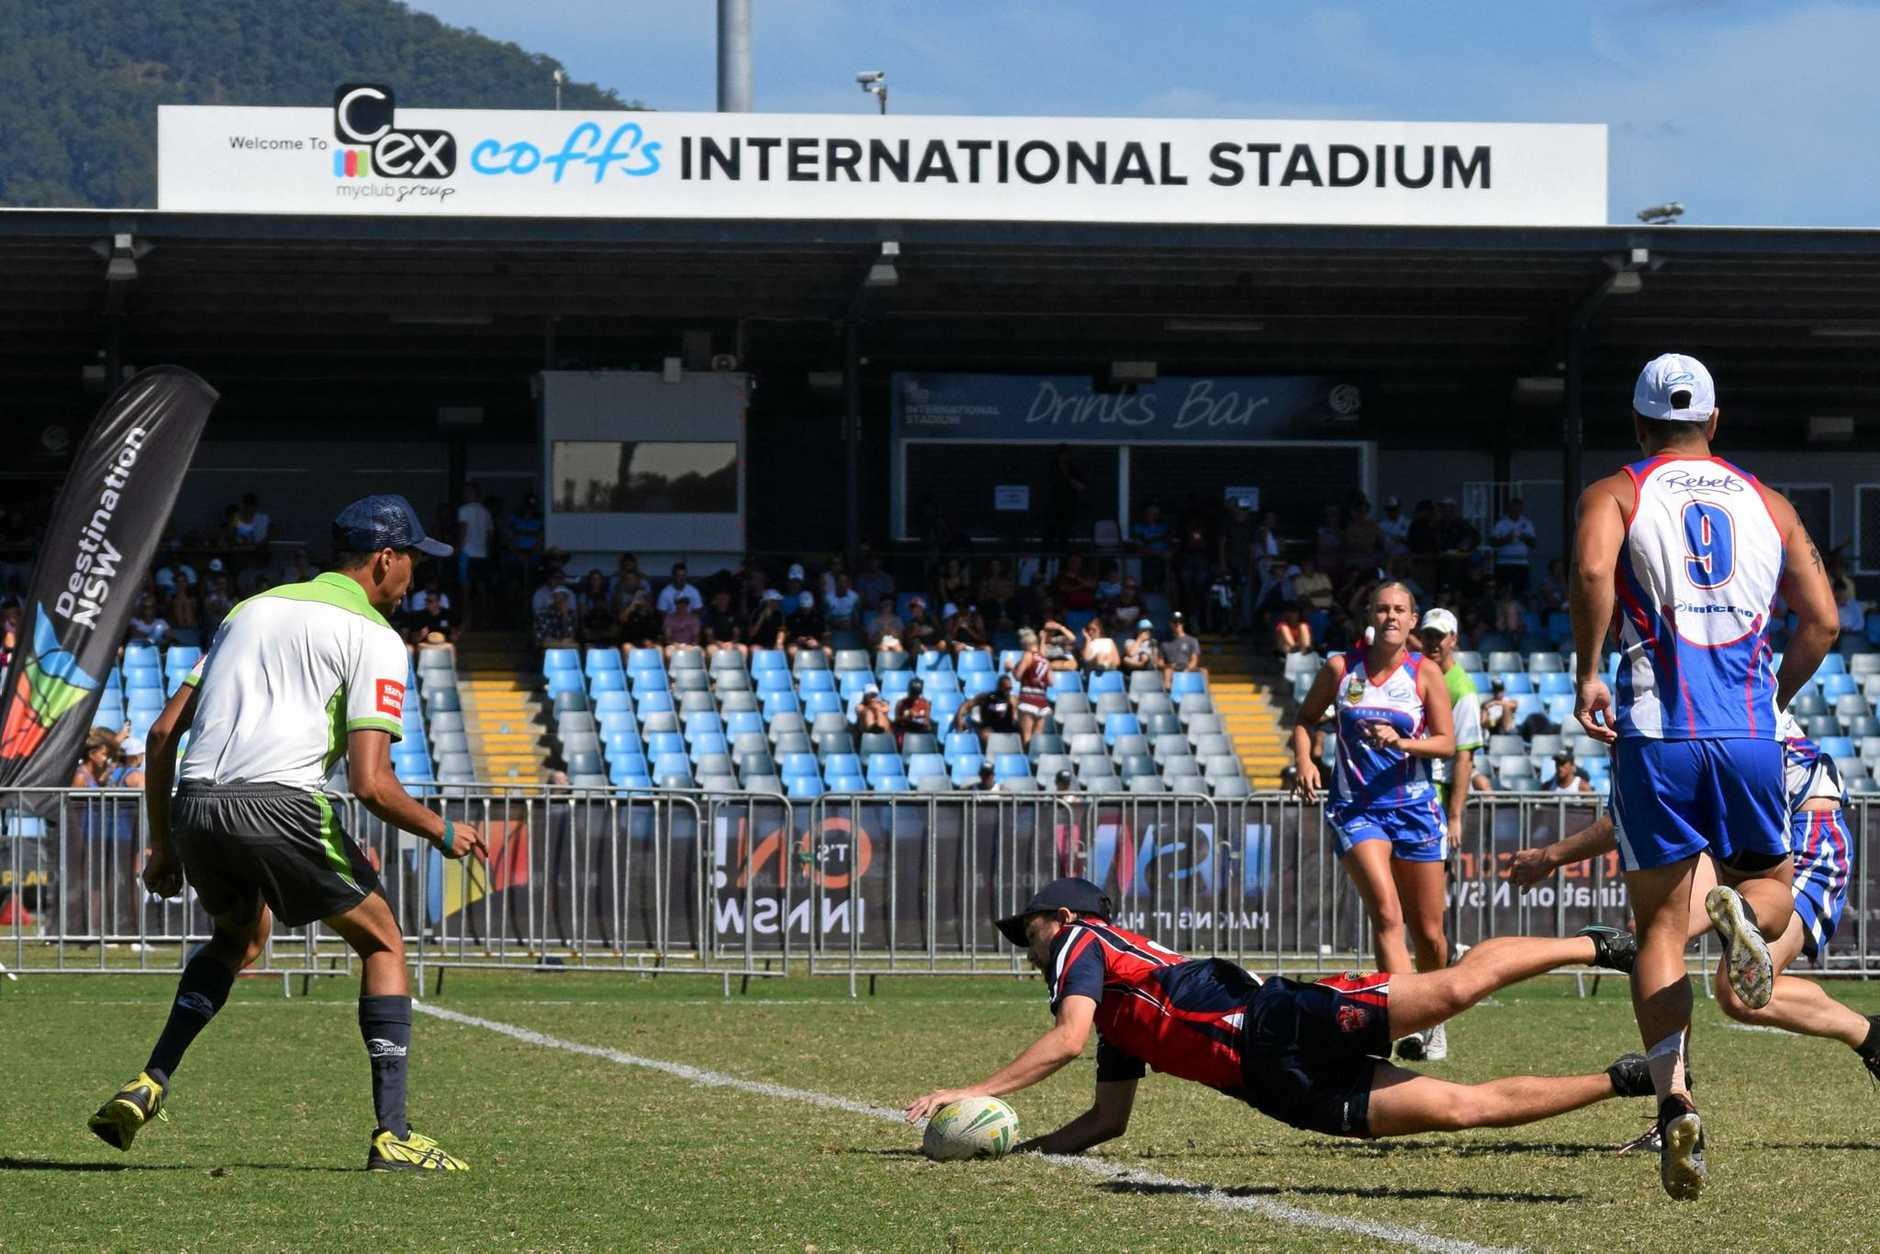 C.ex Coffs International Stadium is set for an upgrade.